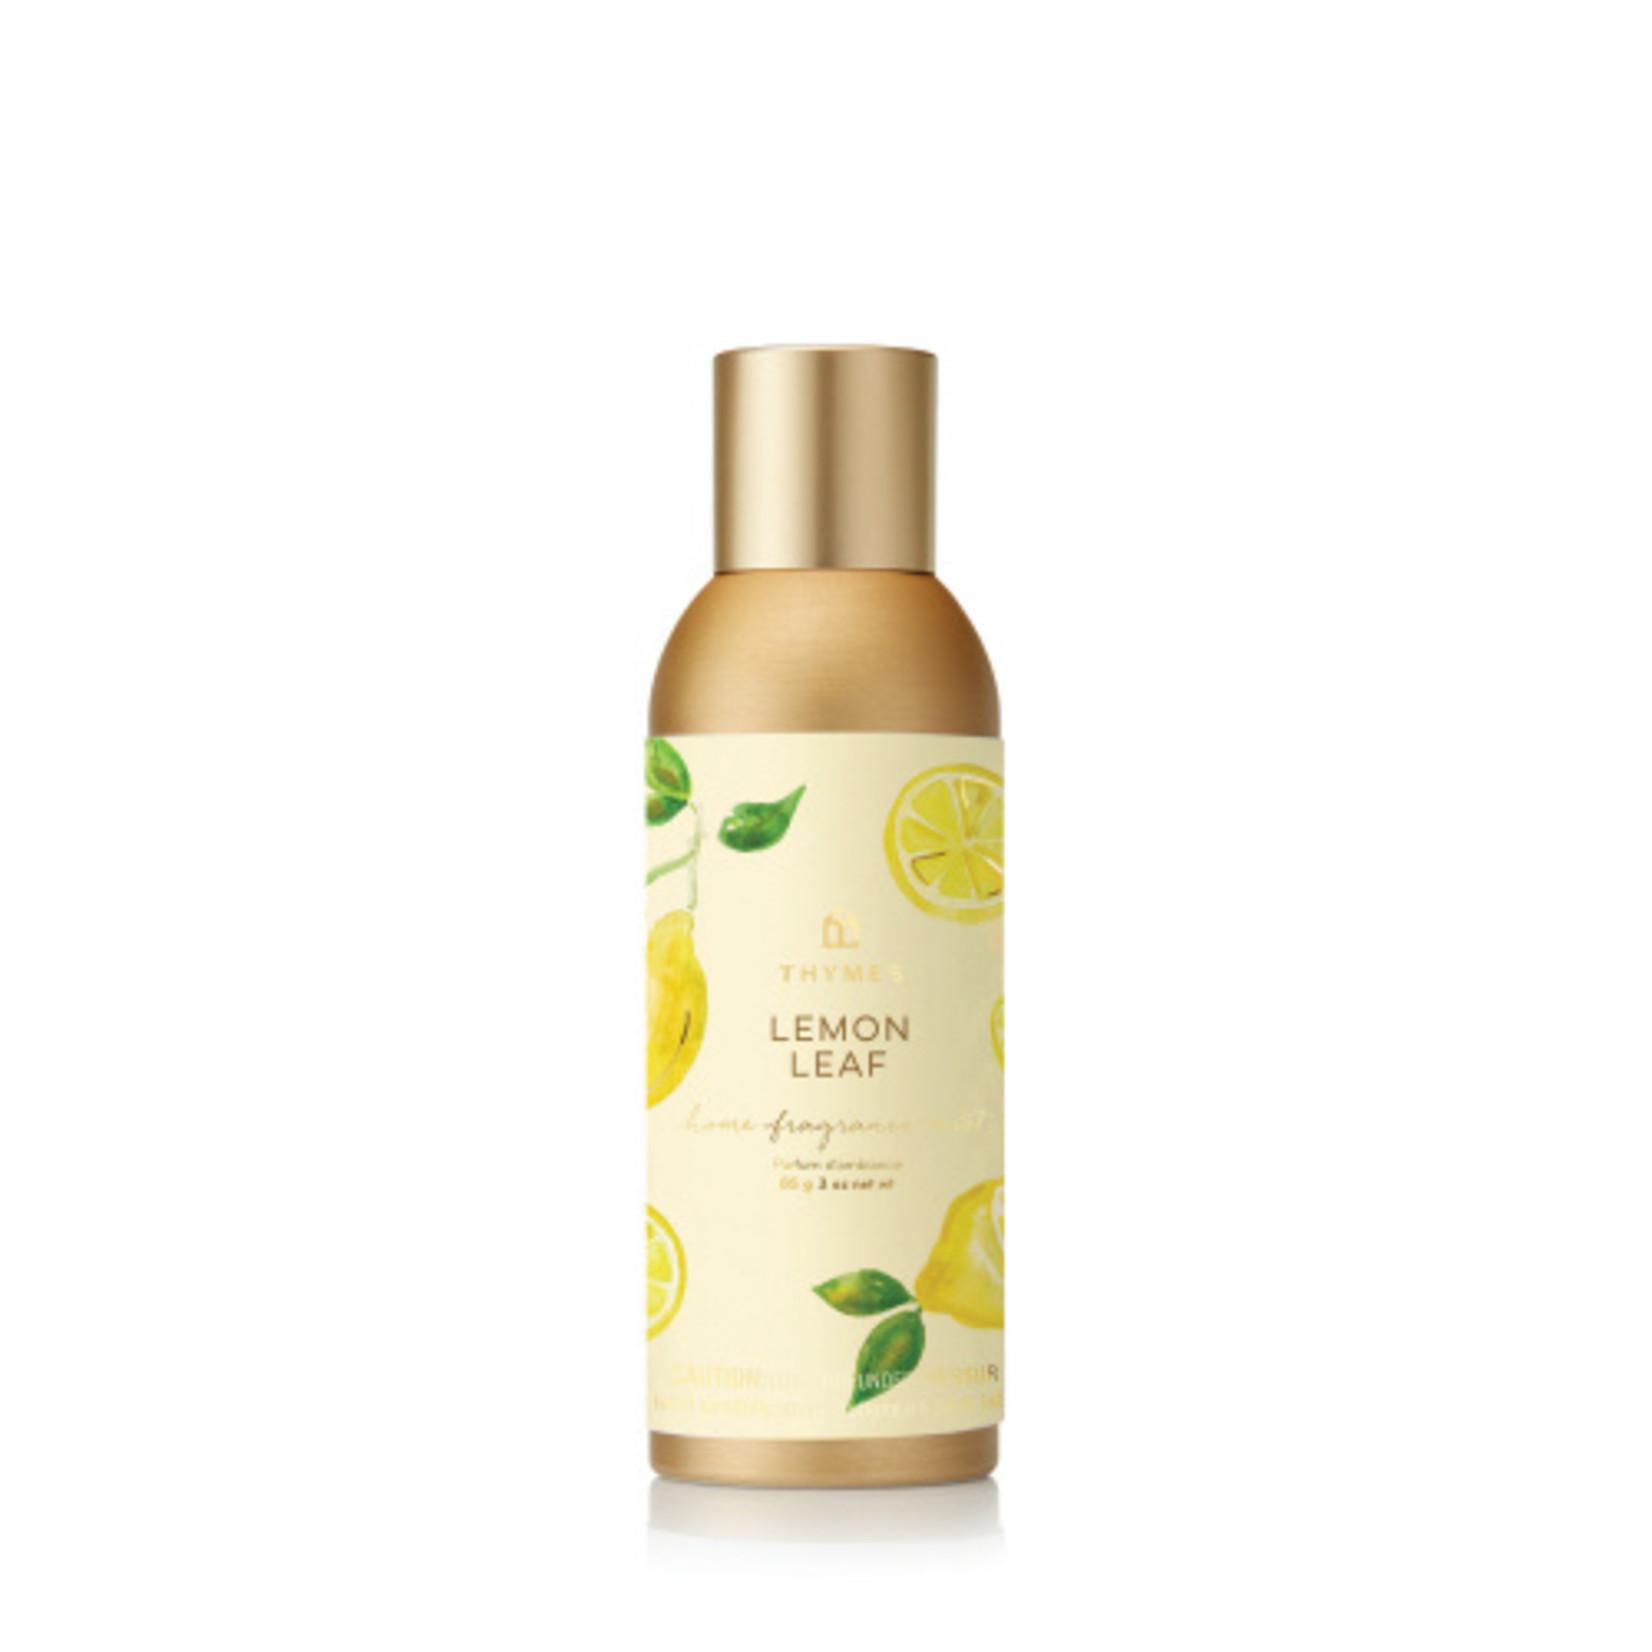 Thymes Lemon Leaf Home Fragrance Mist